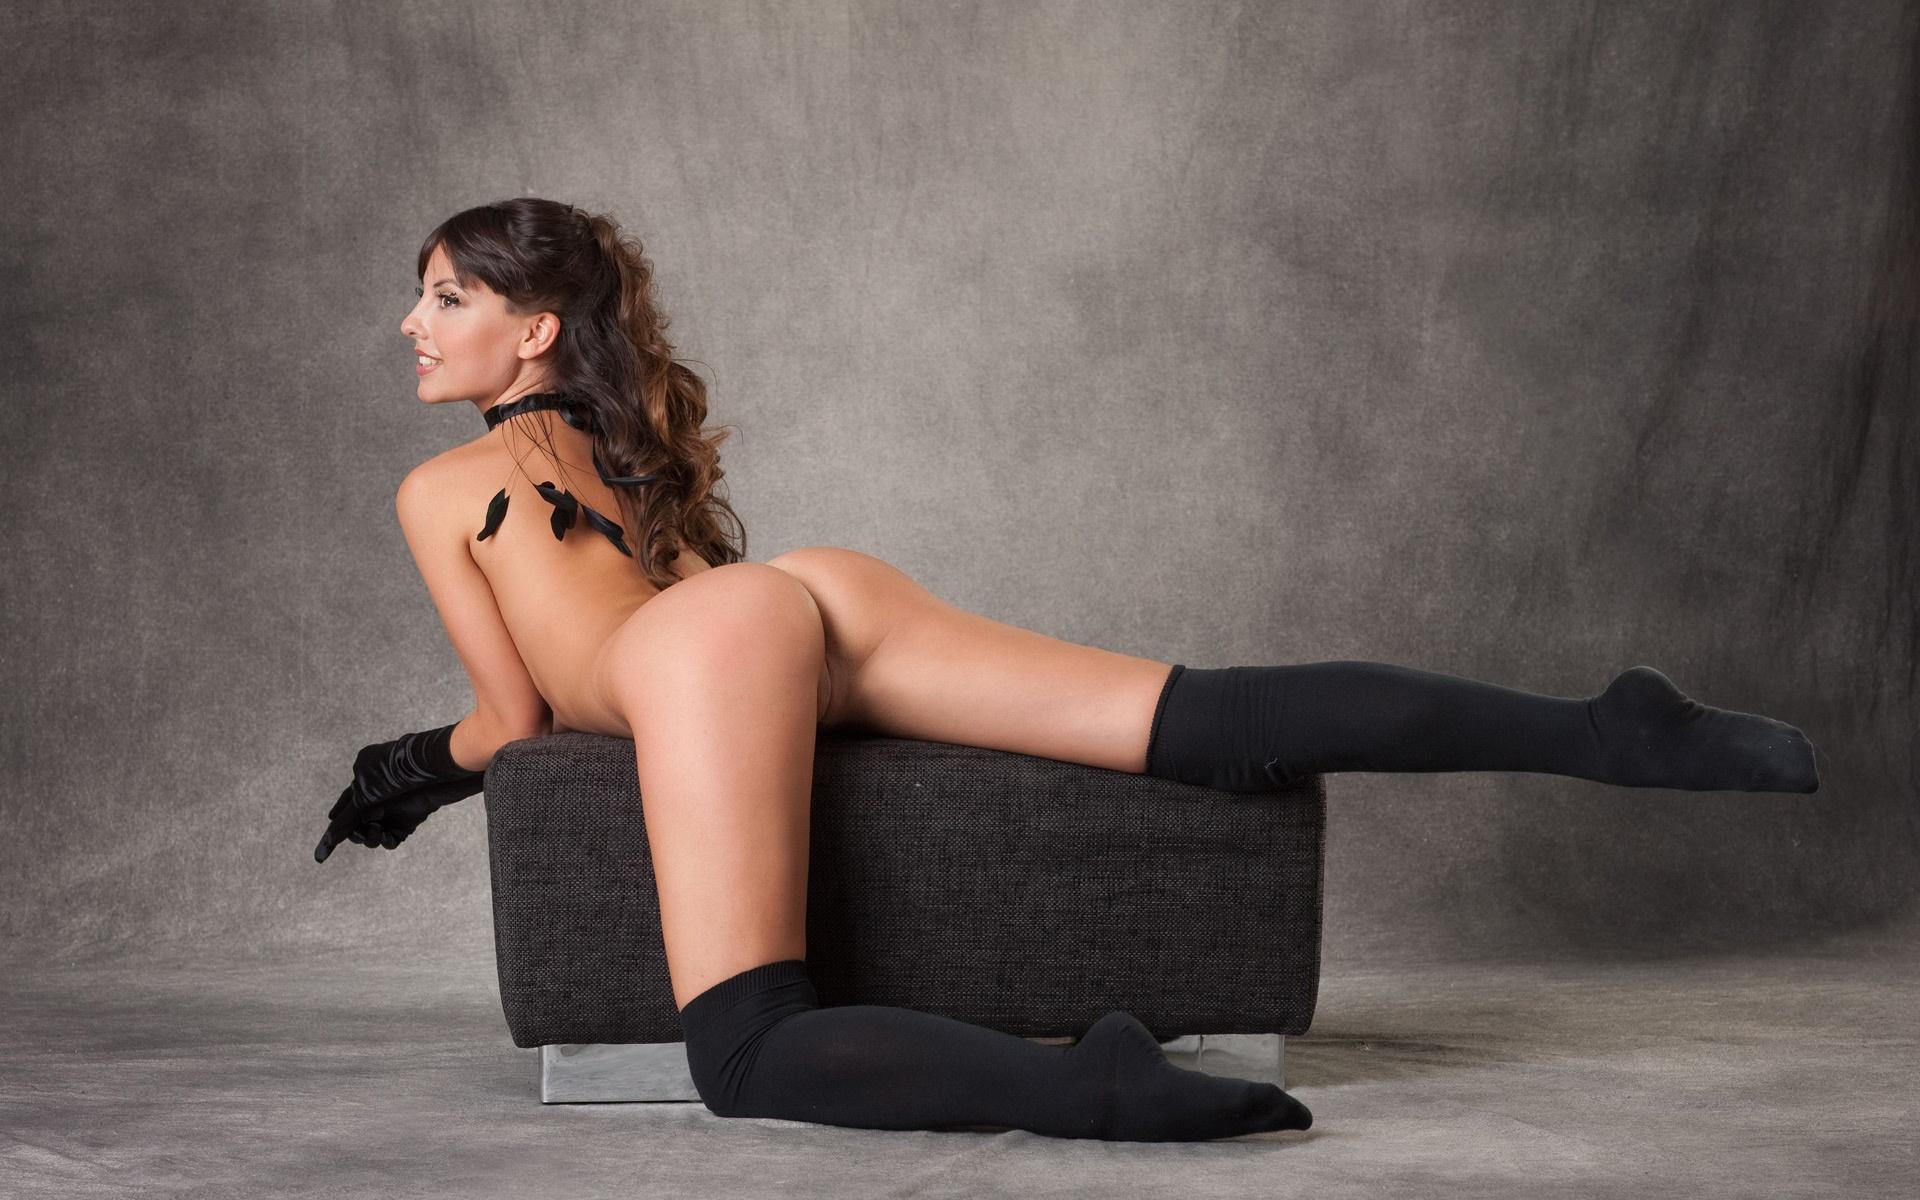 image Amazing hot girl os handcuffed and fucked